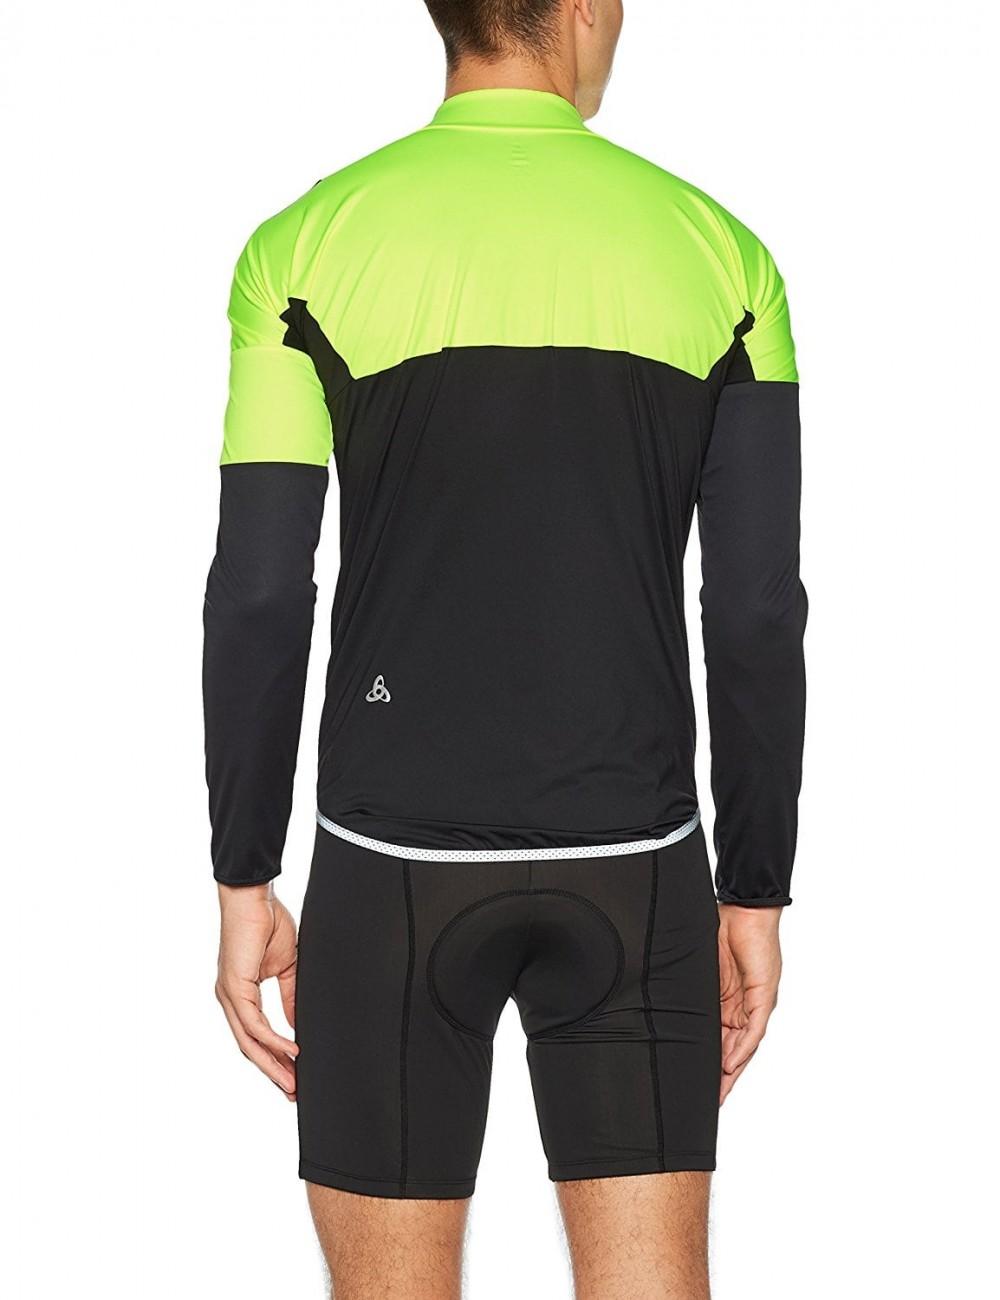 Куртка ODLO mistral logic jacket (размер L) - 2